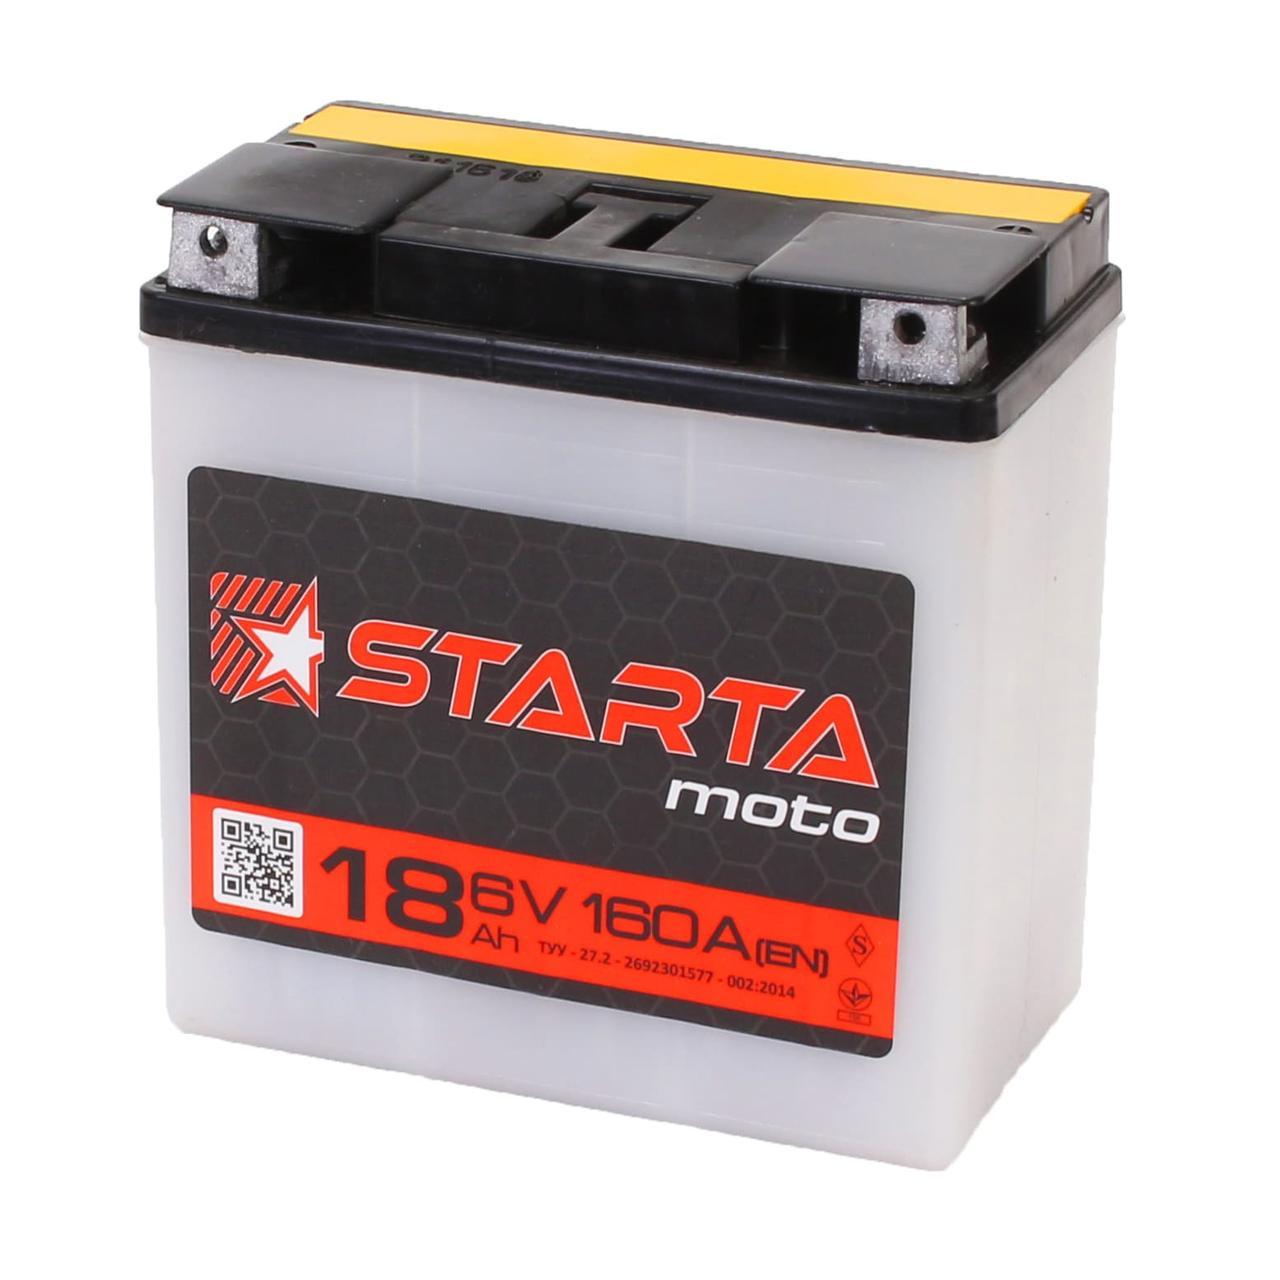 Аккумулятор мото  STARTA Moto 3CT 18 (Под болт), пусковой ток 80А [– +]